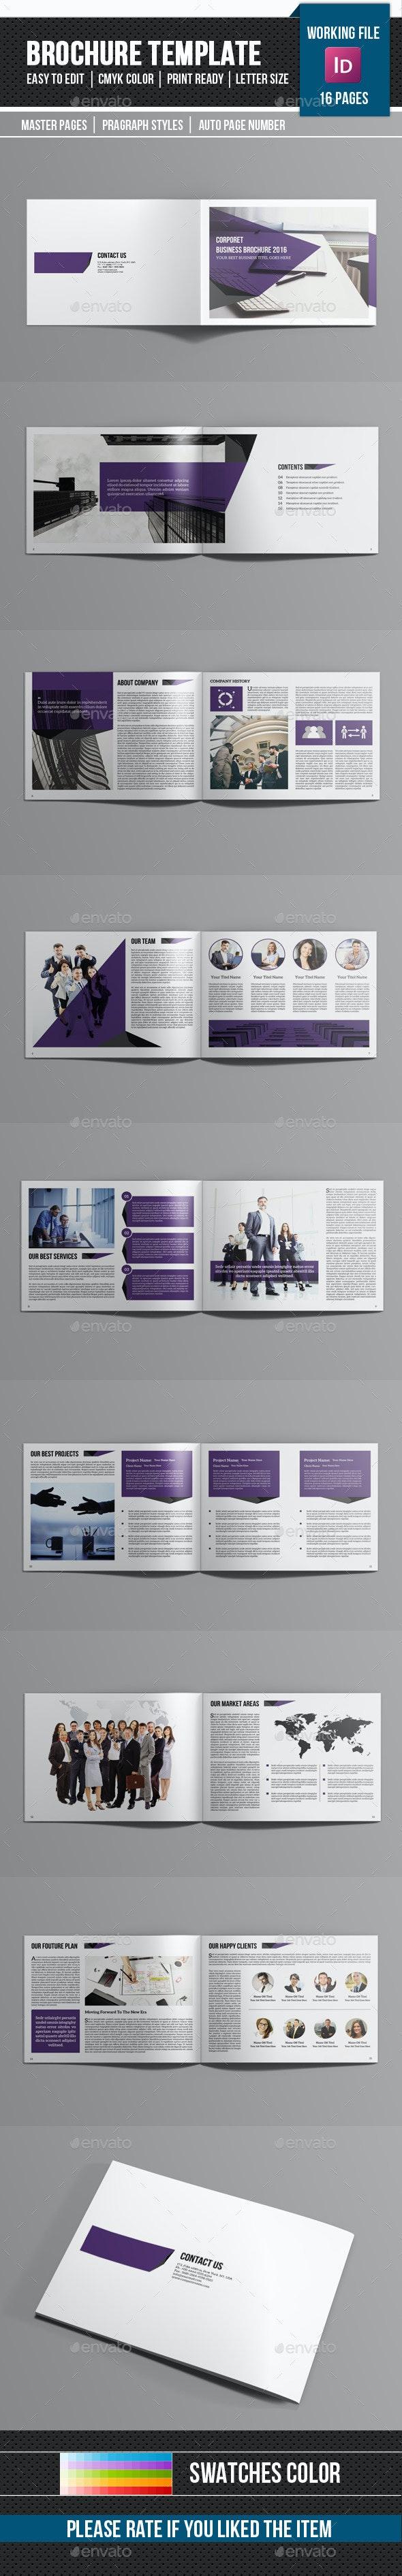 Corporate Catalog/Brochure-V192 - Catalogs Brochures